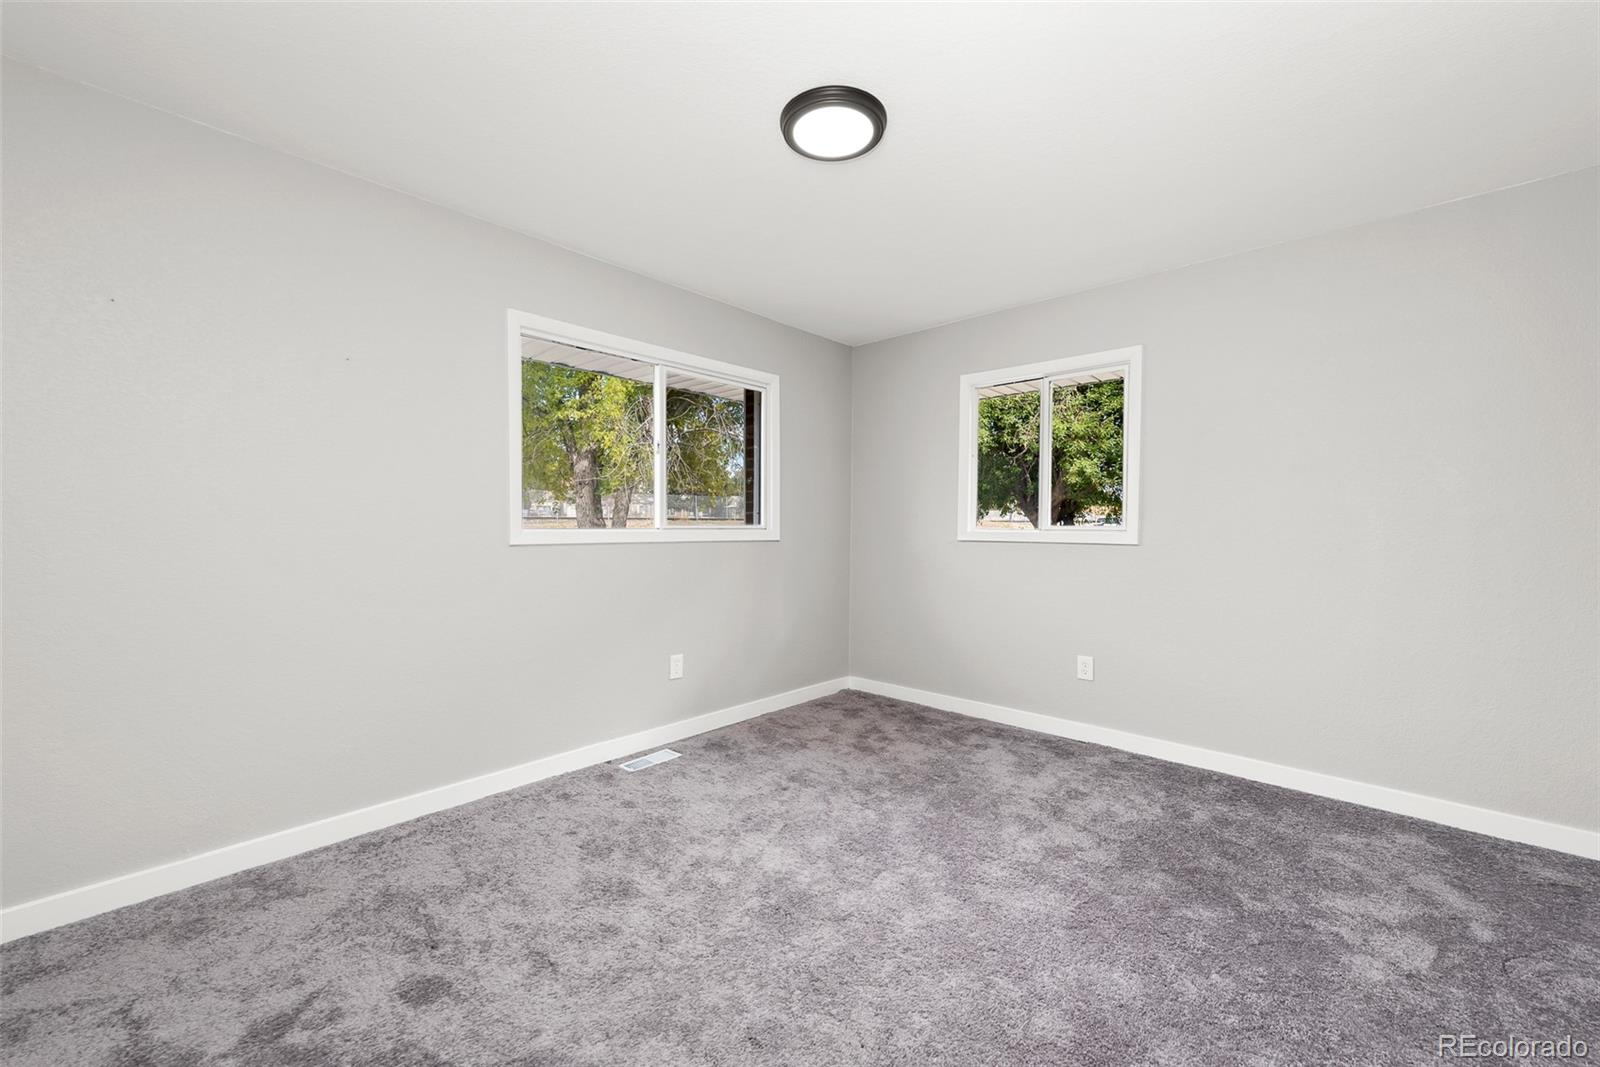 10390 13th, Lakewood, CO